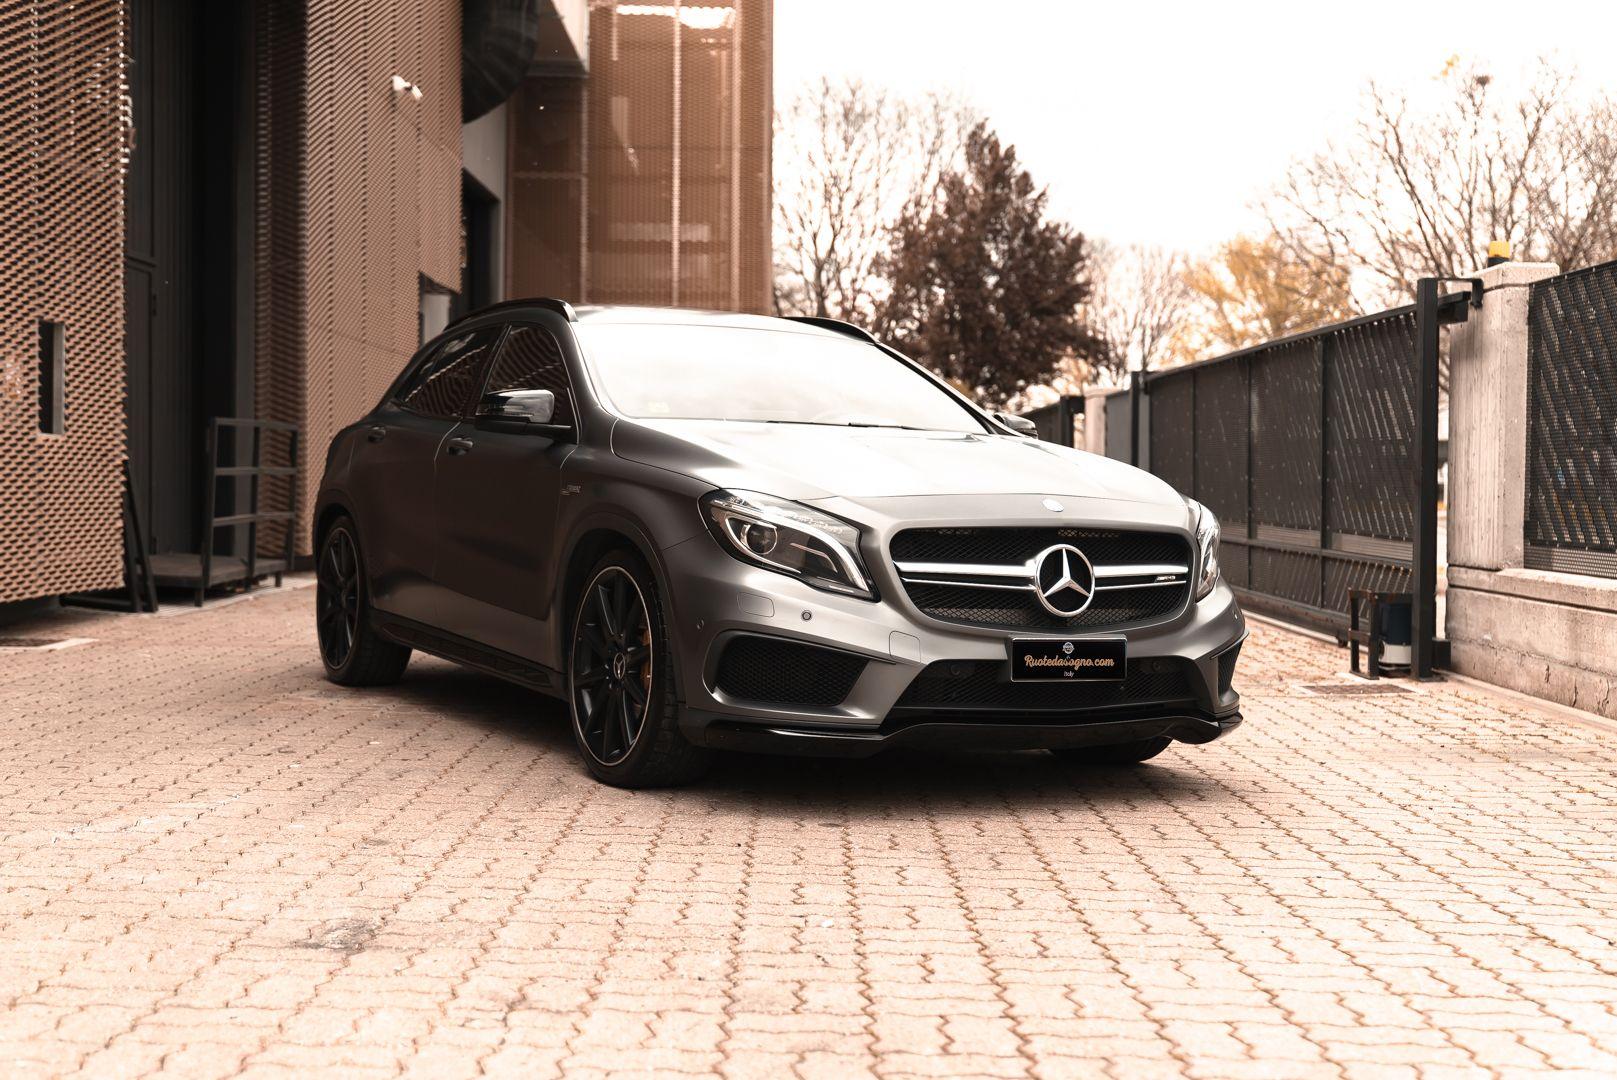 2015 Mercedes-Benz GLA AMG 45 68288